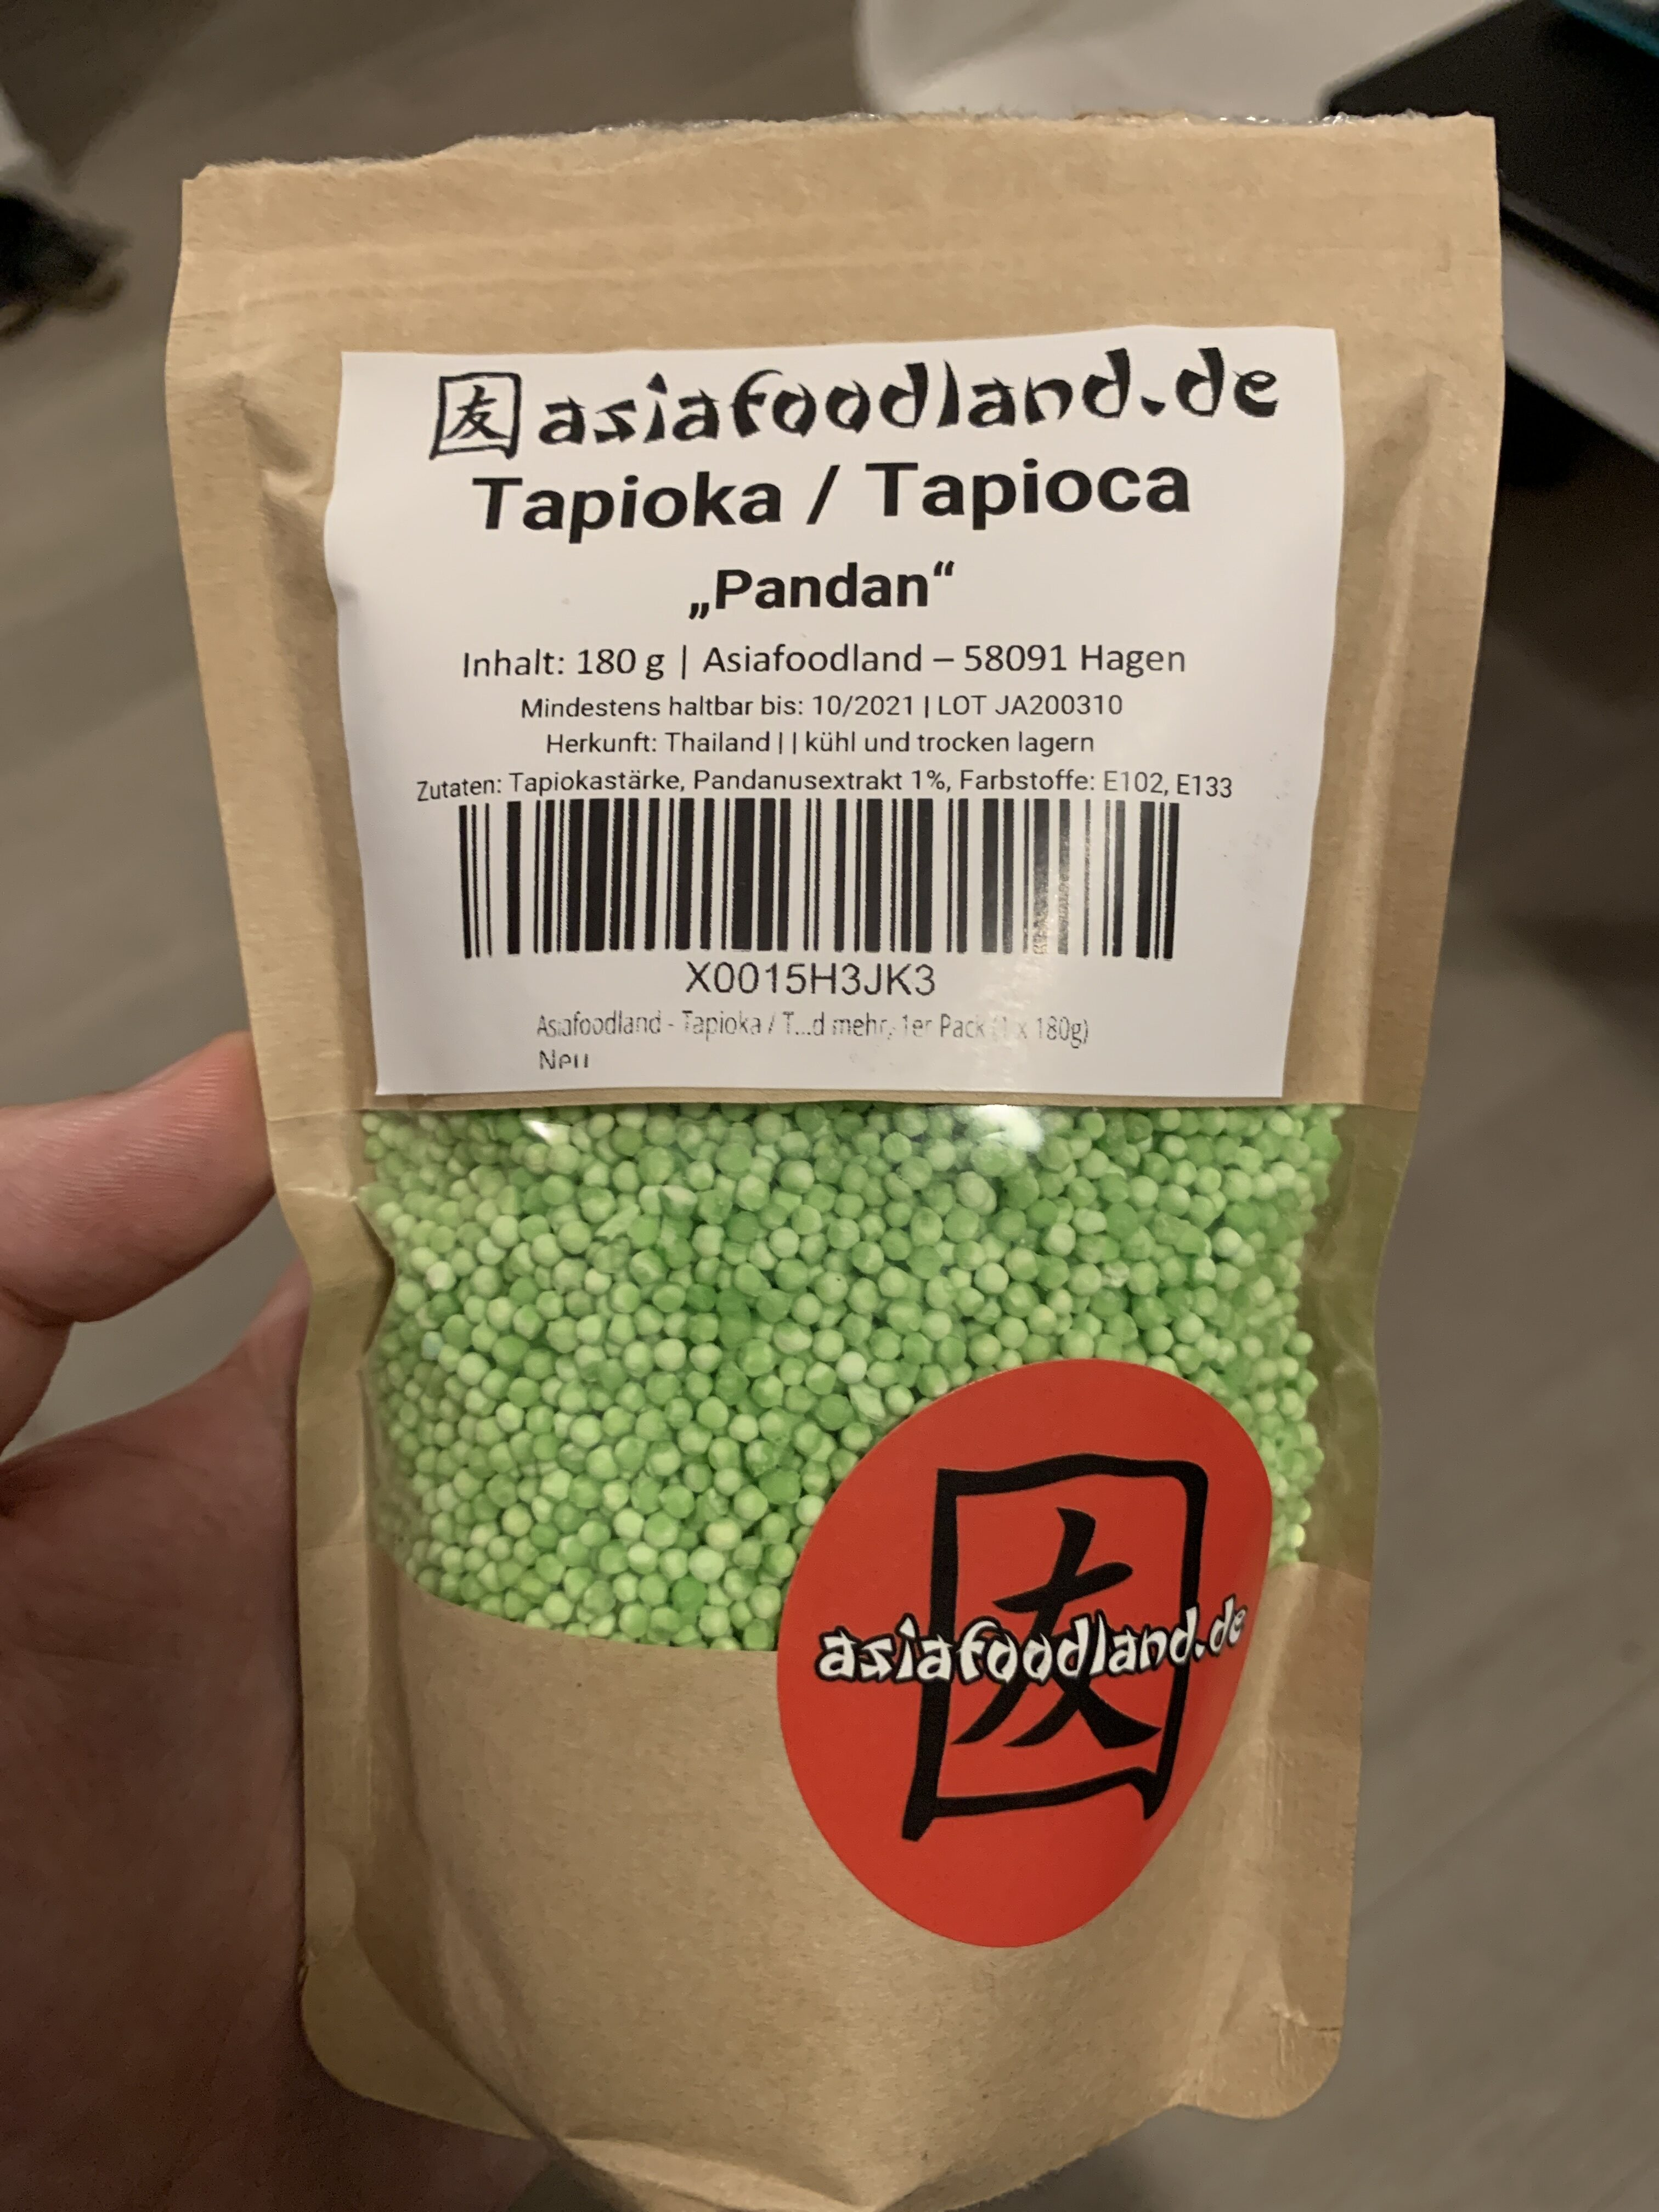 "Tapioka / Tapioca ""Pandan"" - Product - de"